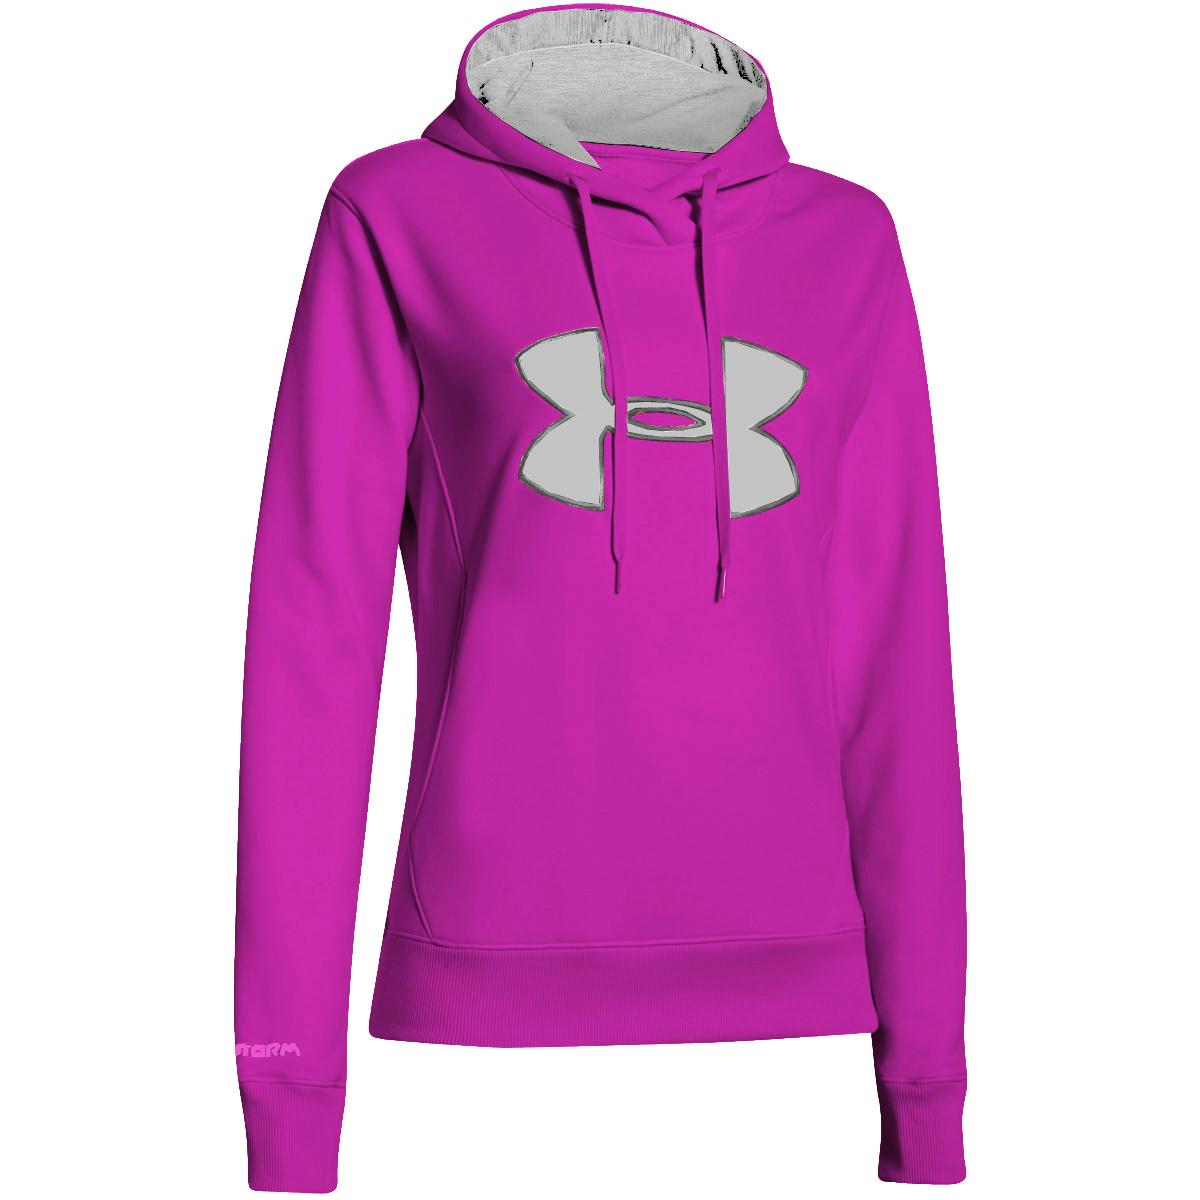 Under armour womens hoodies big logo